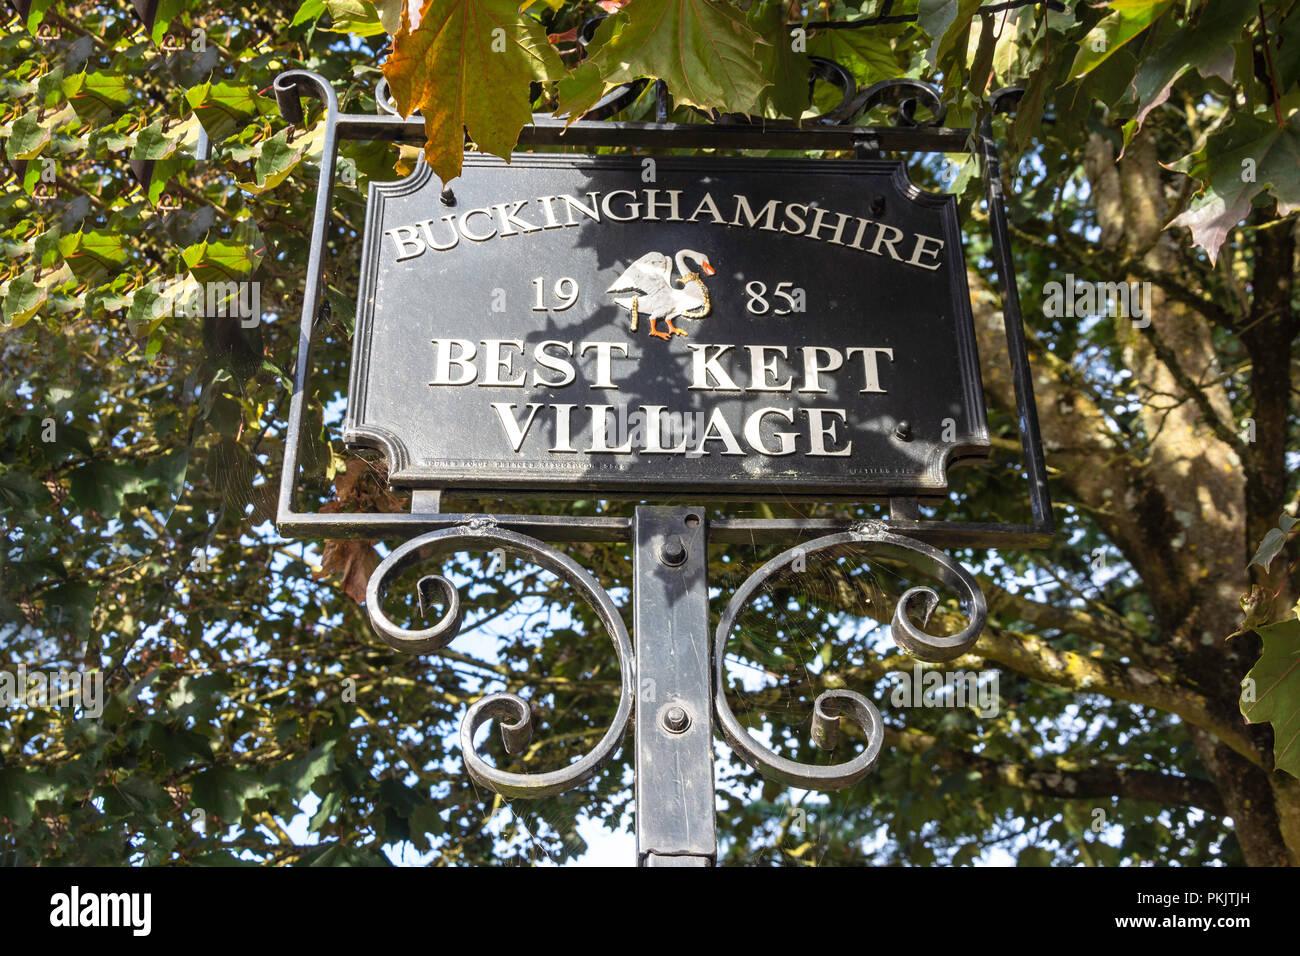 Buckinghamshire best kept village sign, Windmill Road, Fulmer, Buckinghamshire, England, United Kingdom - Stock Image